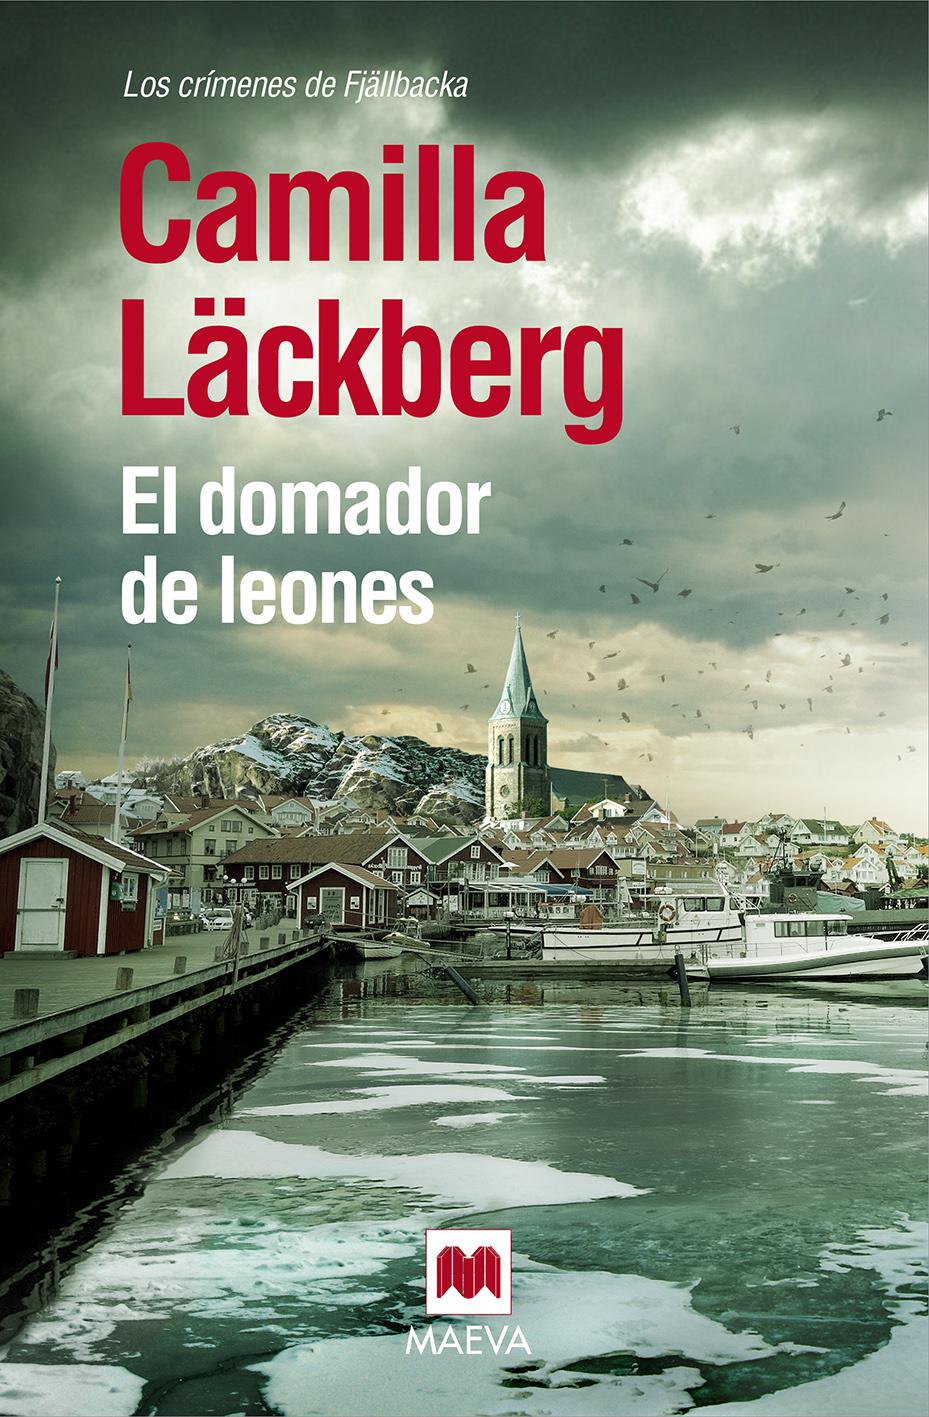 El domador de leones - Camilla Lackberg (Portada)